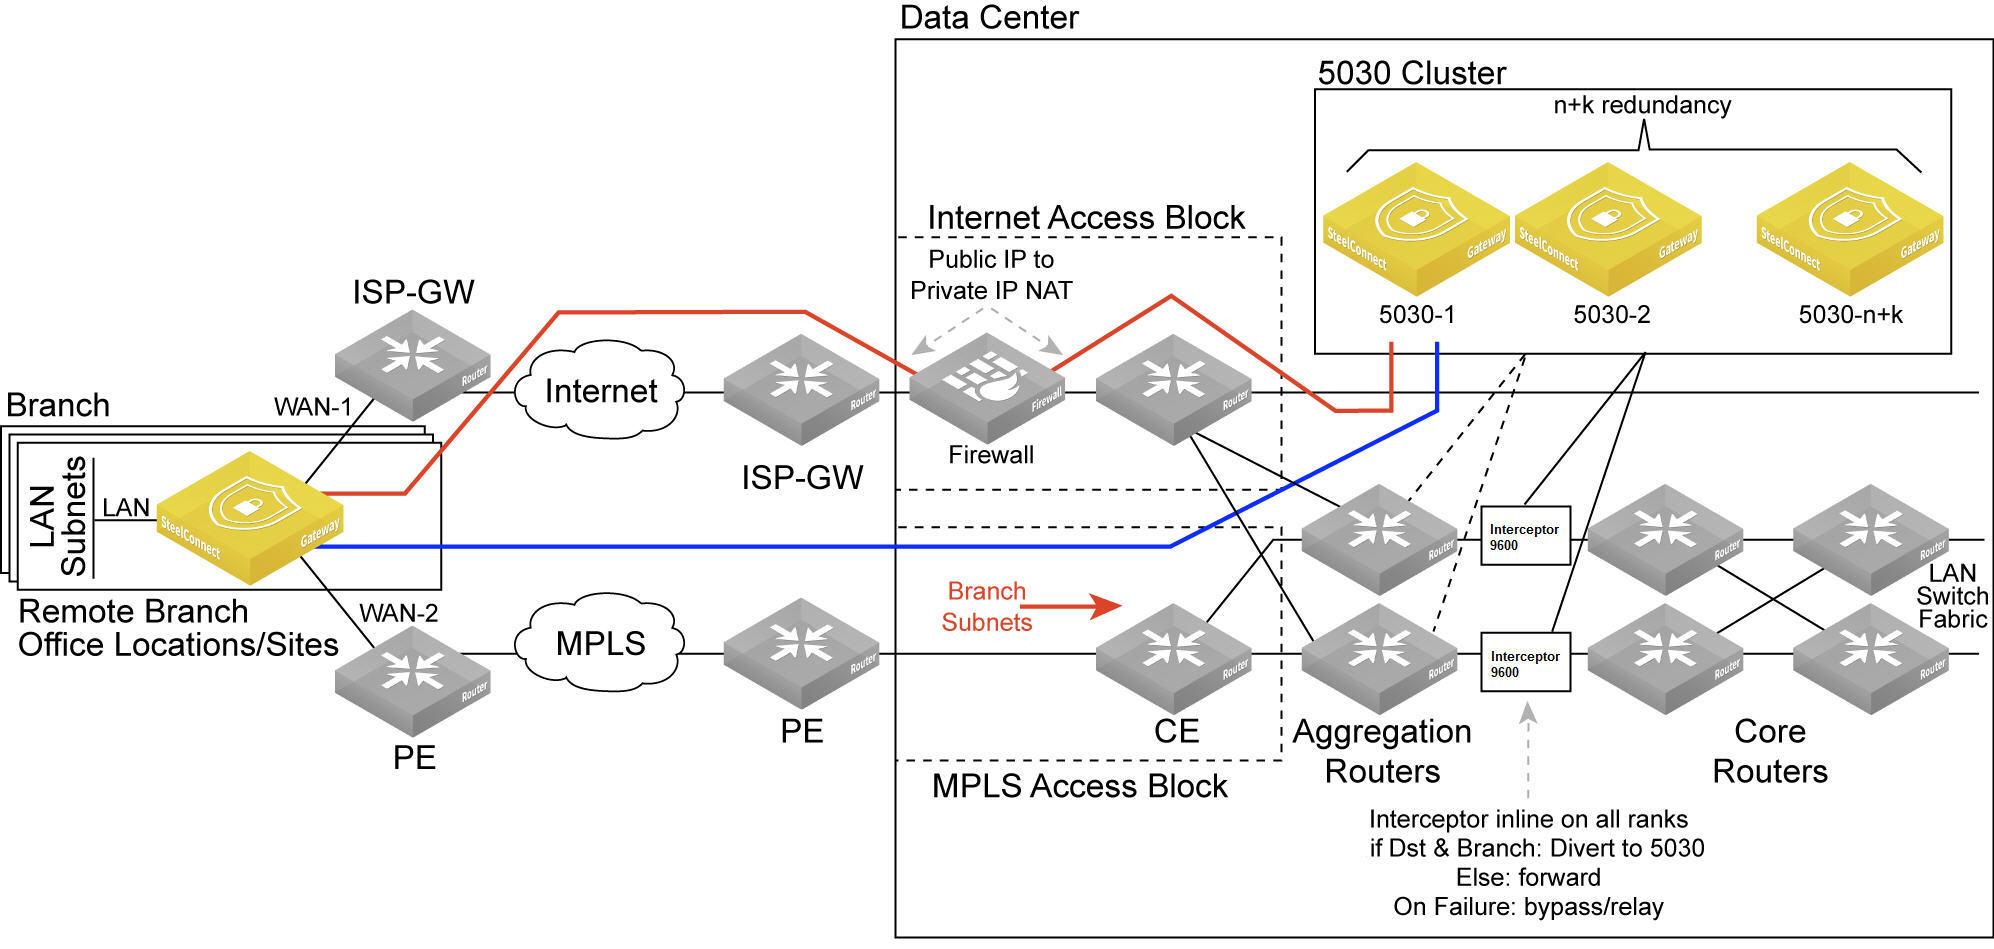 Data center gateway cluster topology